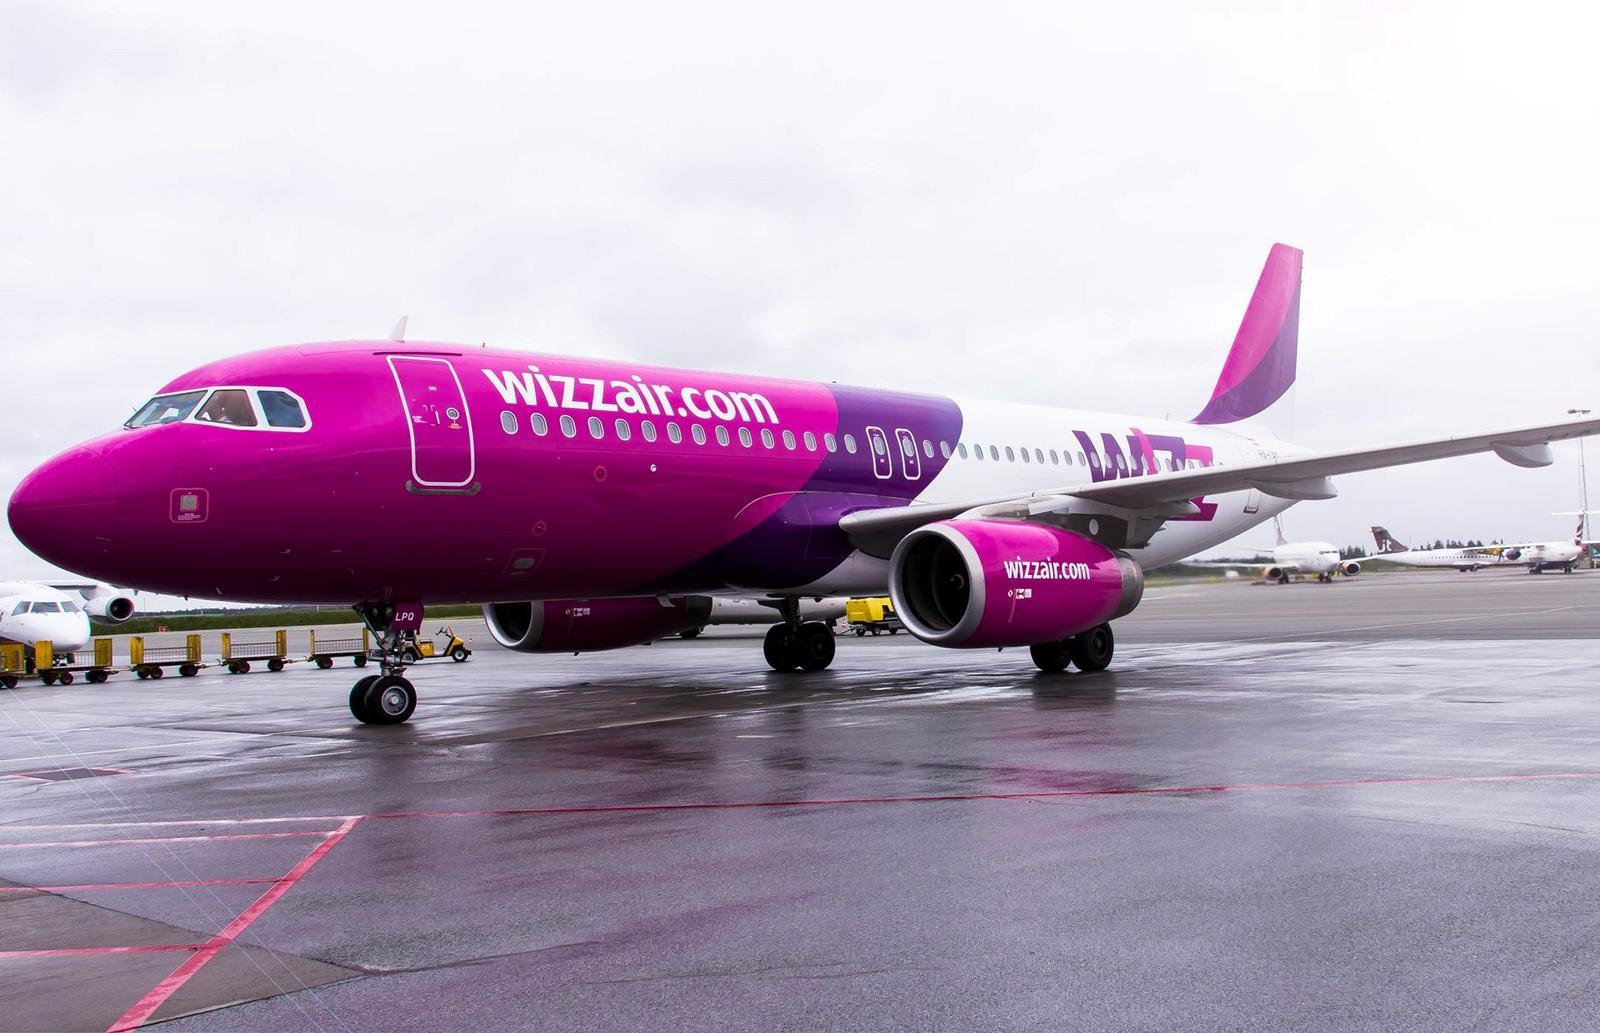 Wizz Air Airbus A320 i Billund Lufthavn (Foto: BLL)